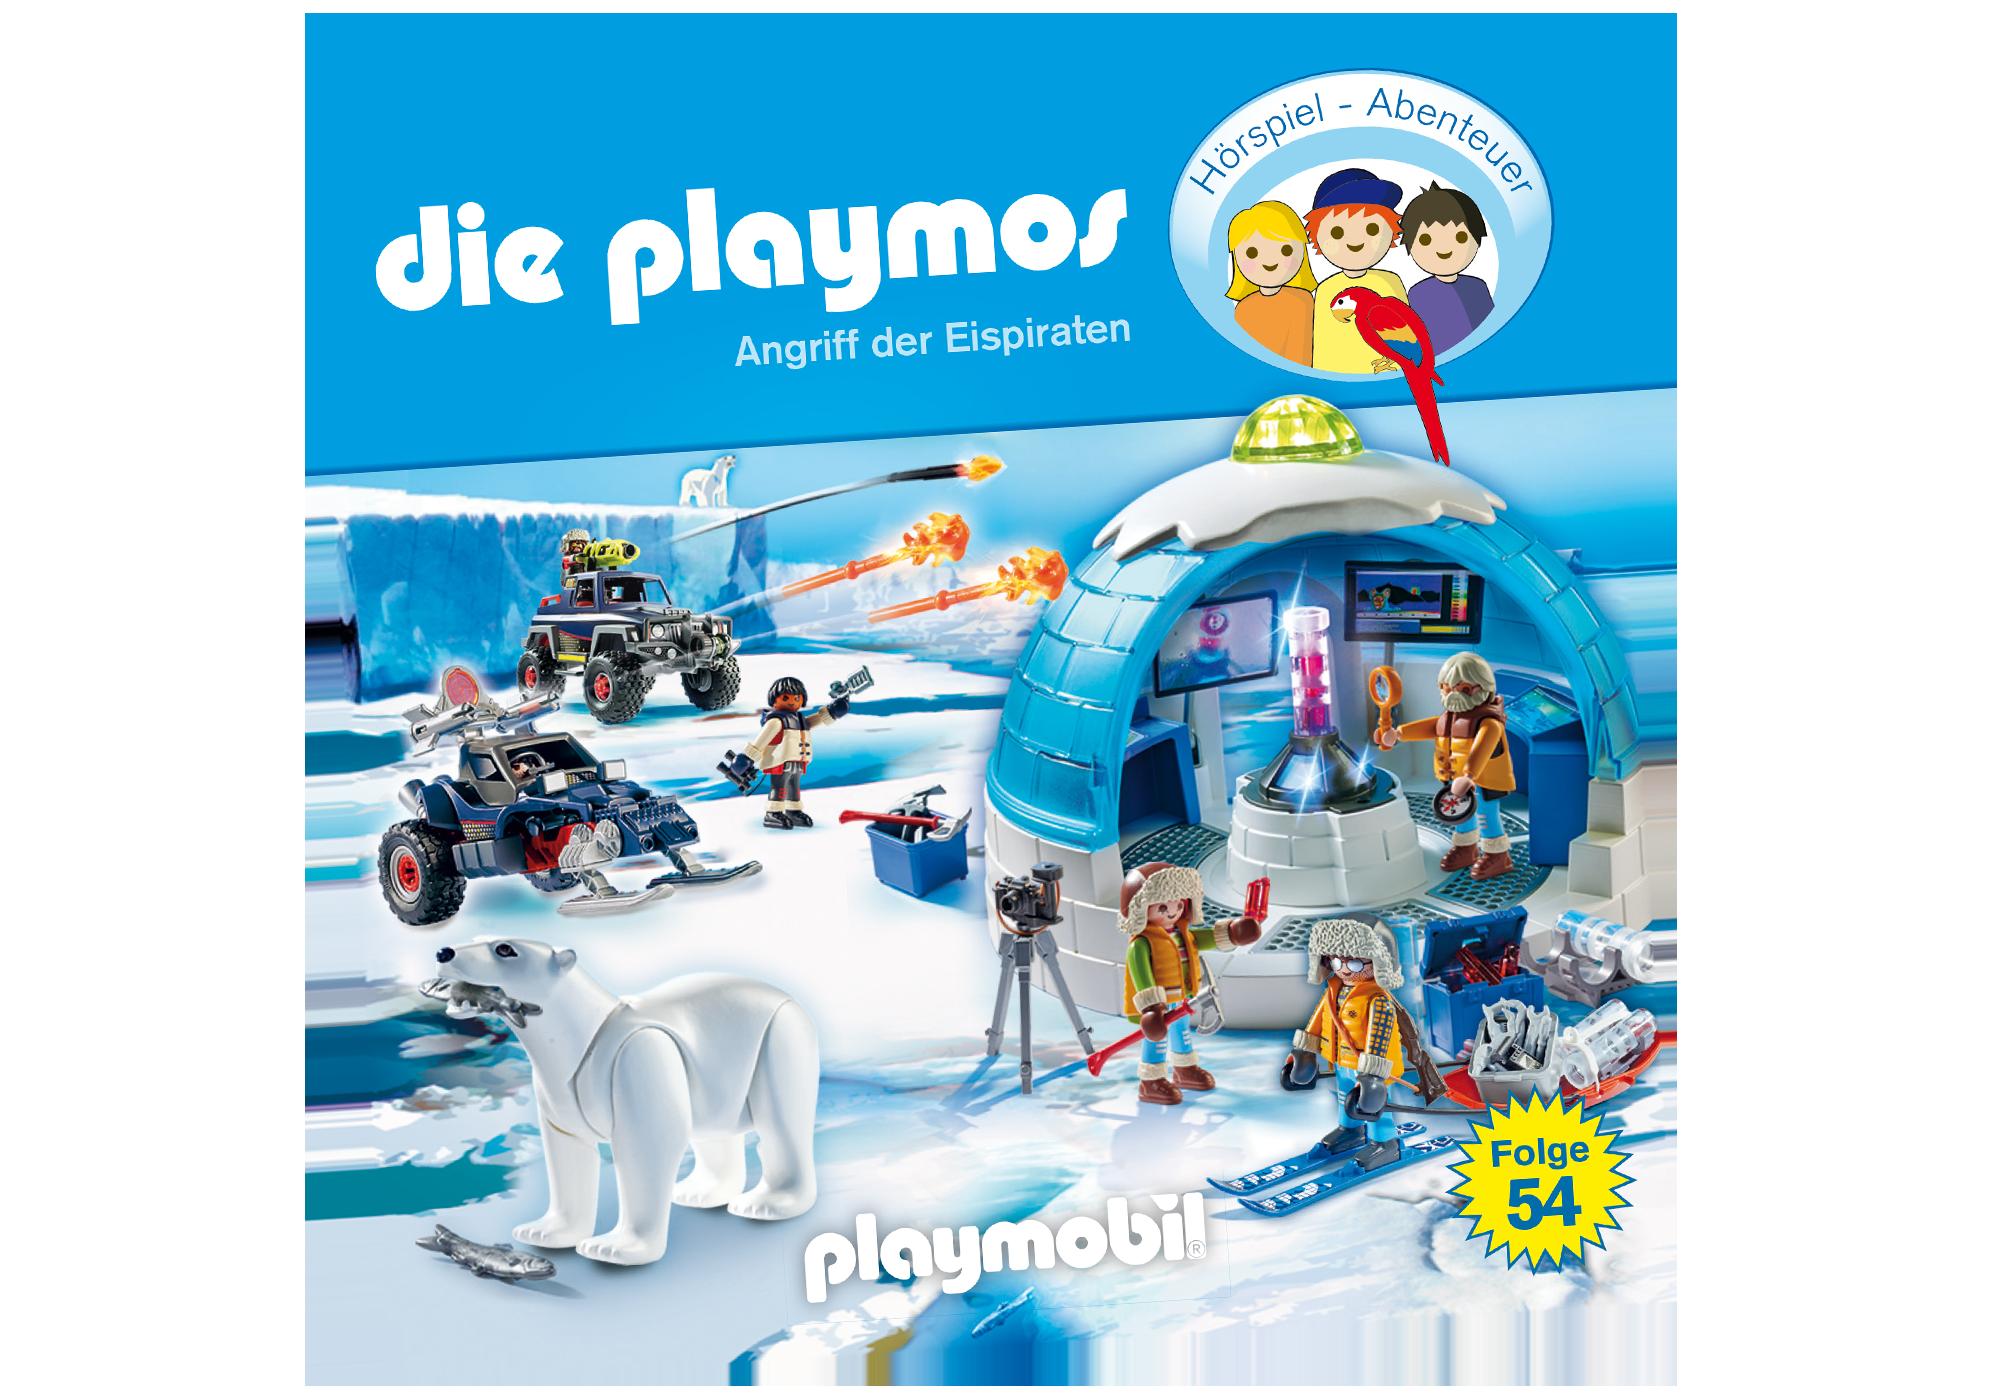 http://media.playmobil.com/i/playmobil/80483_product_detail/Angriff der Eispiraten - Folge 54